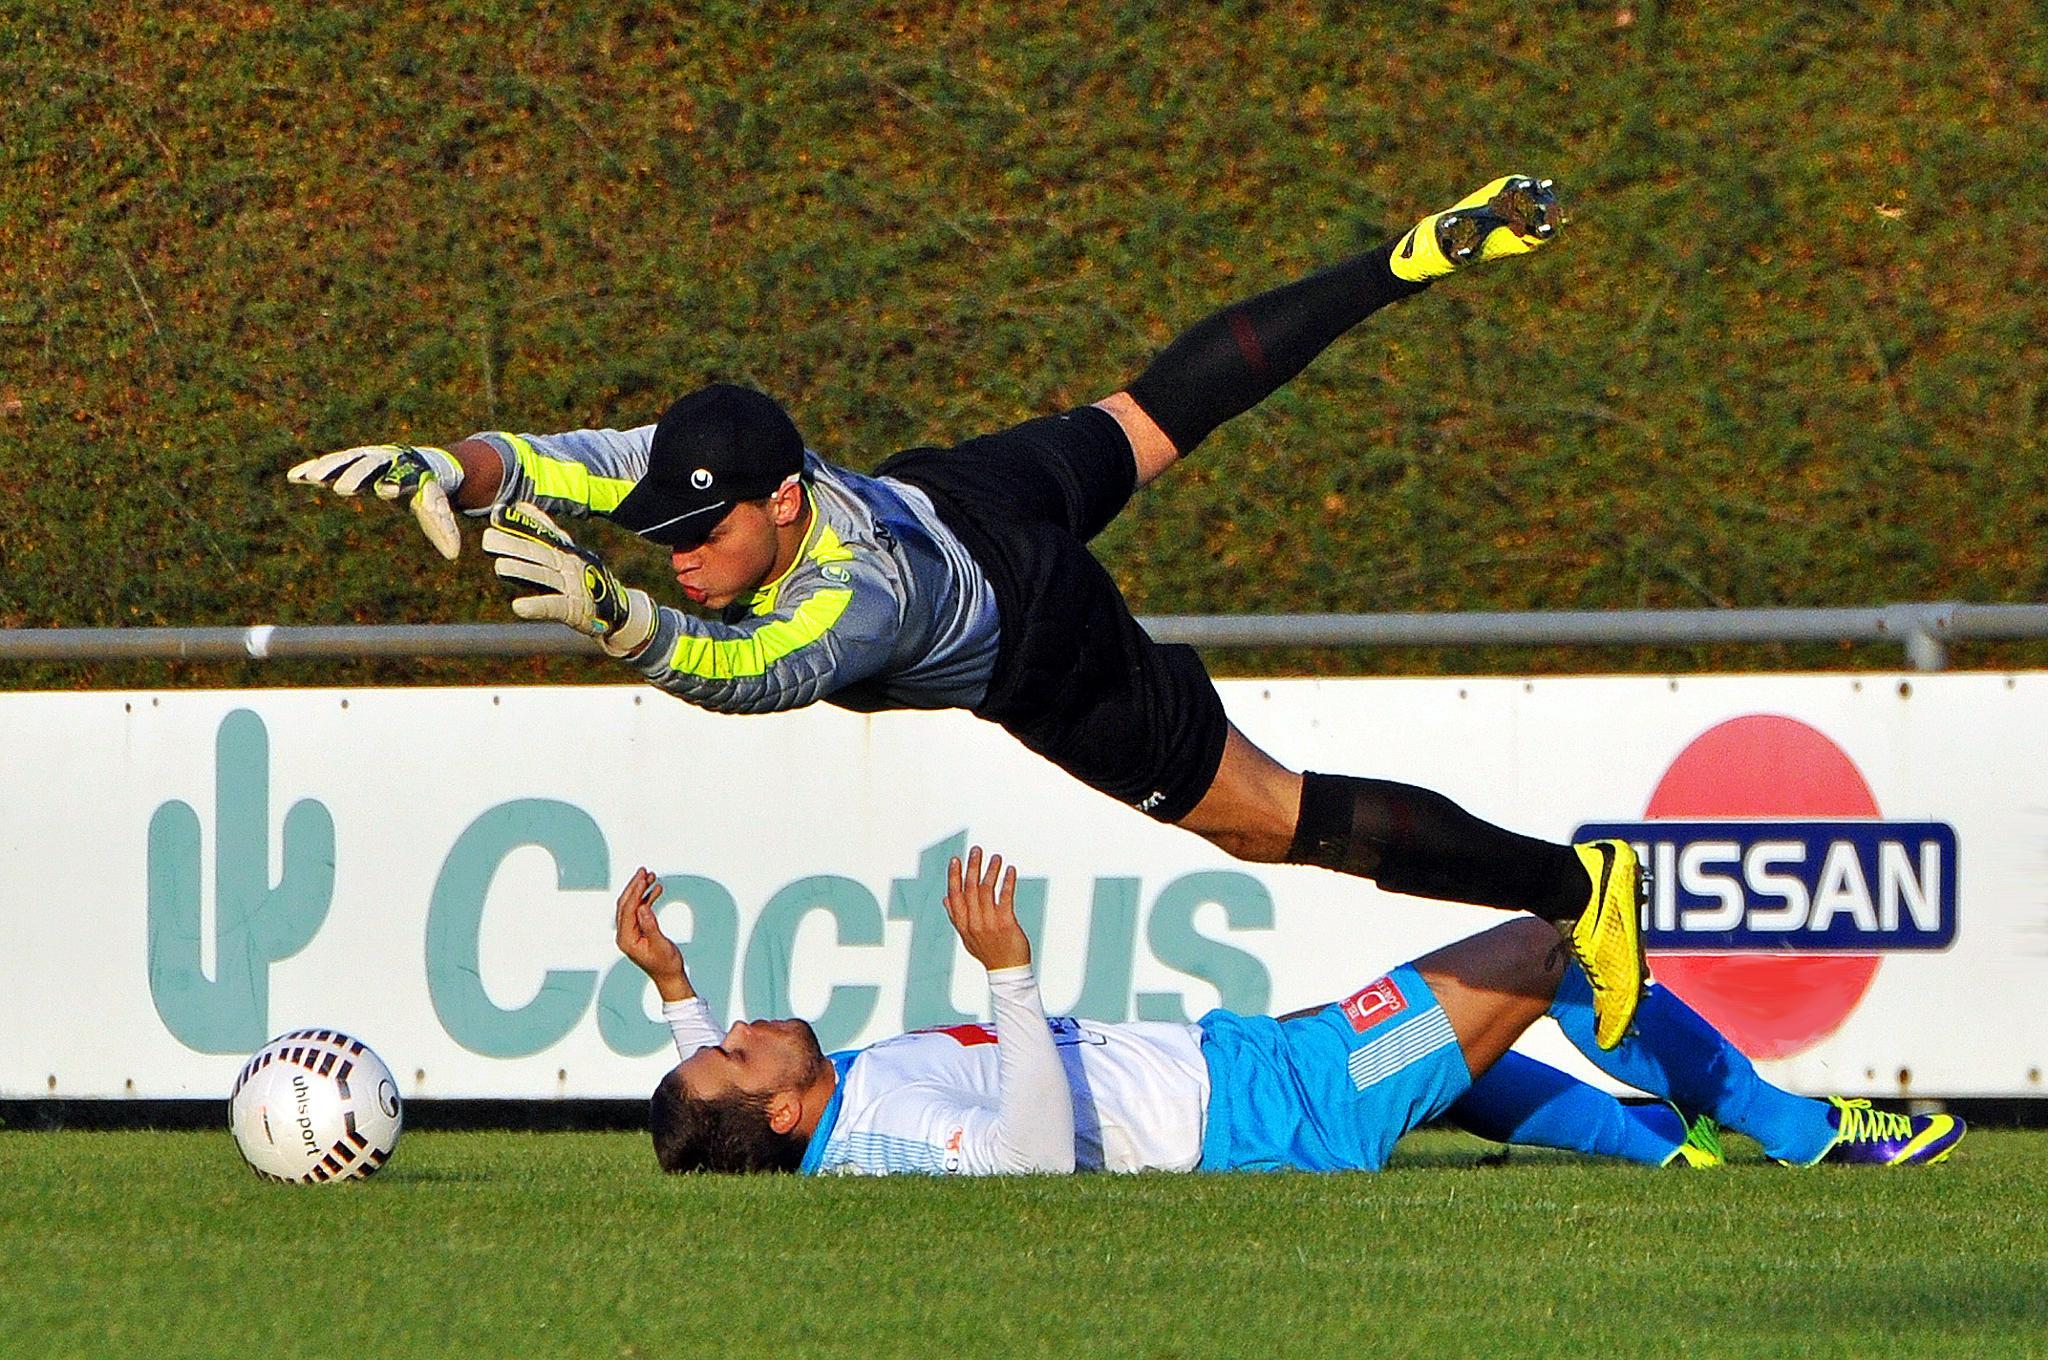 Photo in Sports #soccer #football #forwarder #goalkeeper #duel #ball #lying #green #grass #jumping #flying